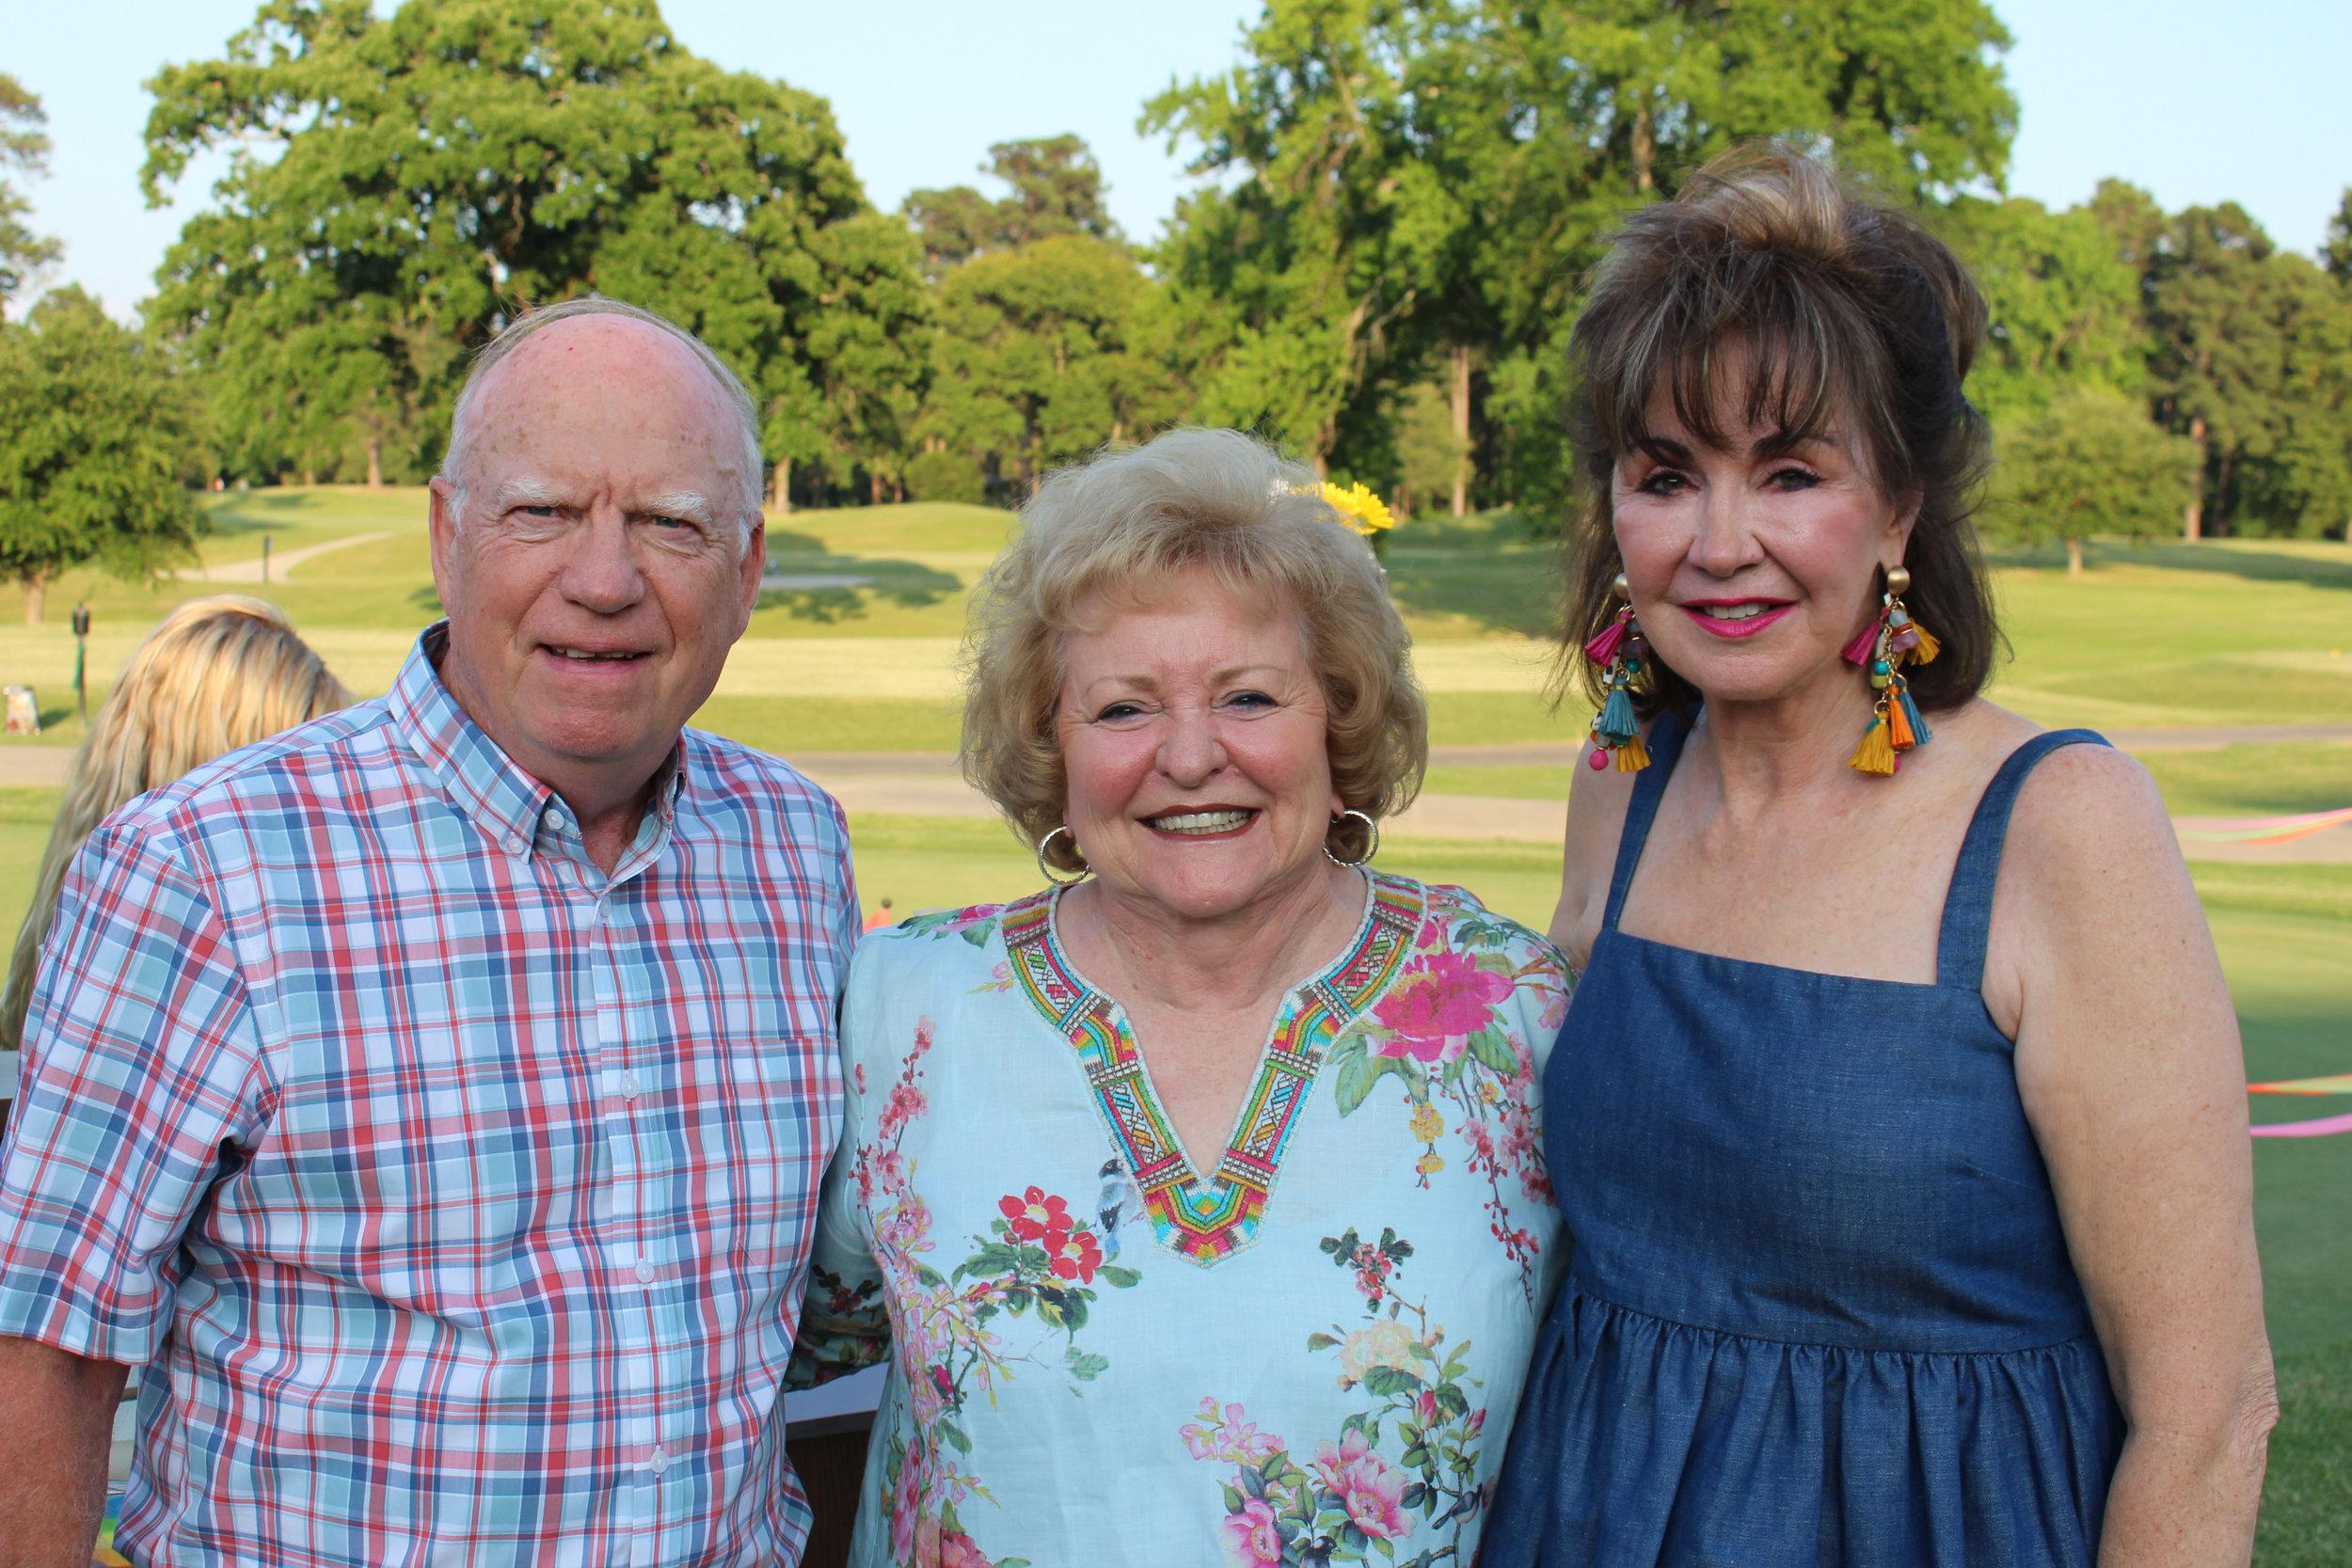 Judge Jack and Joan Carter with Judy Morgan